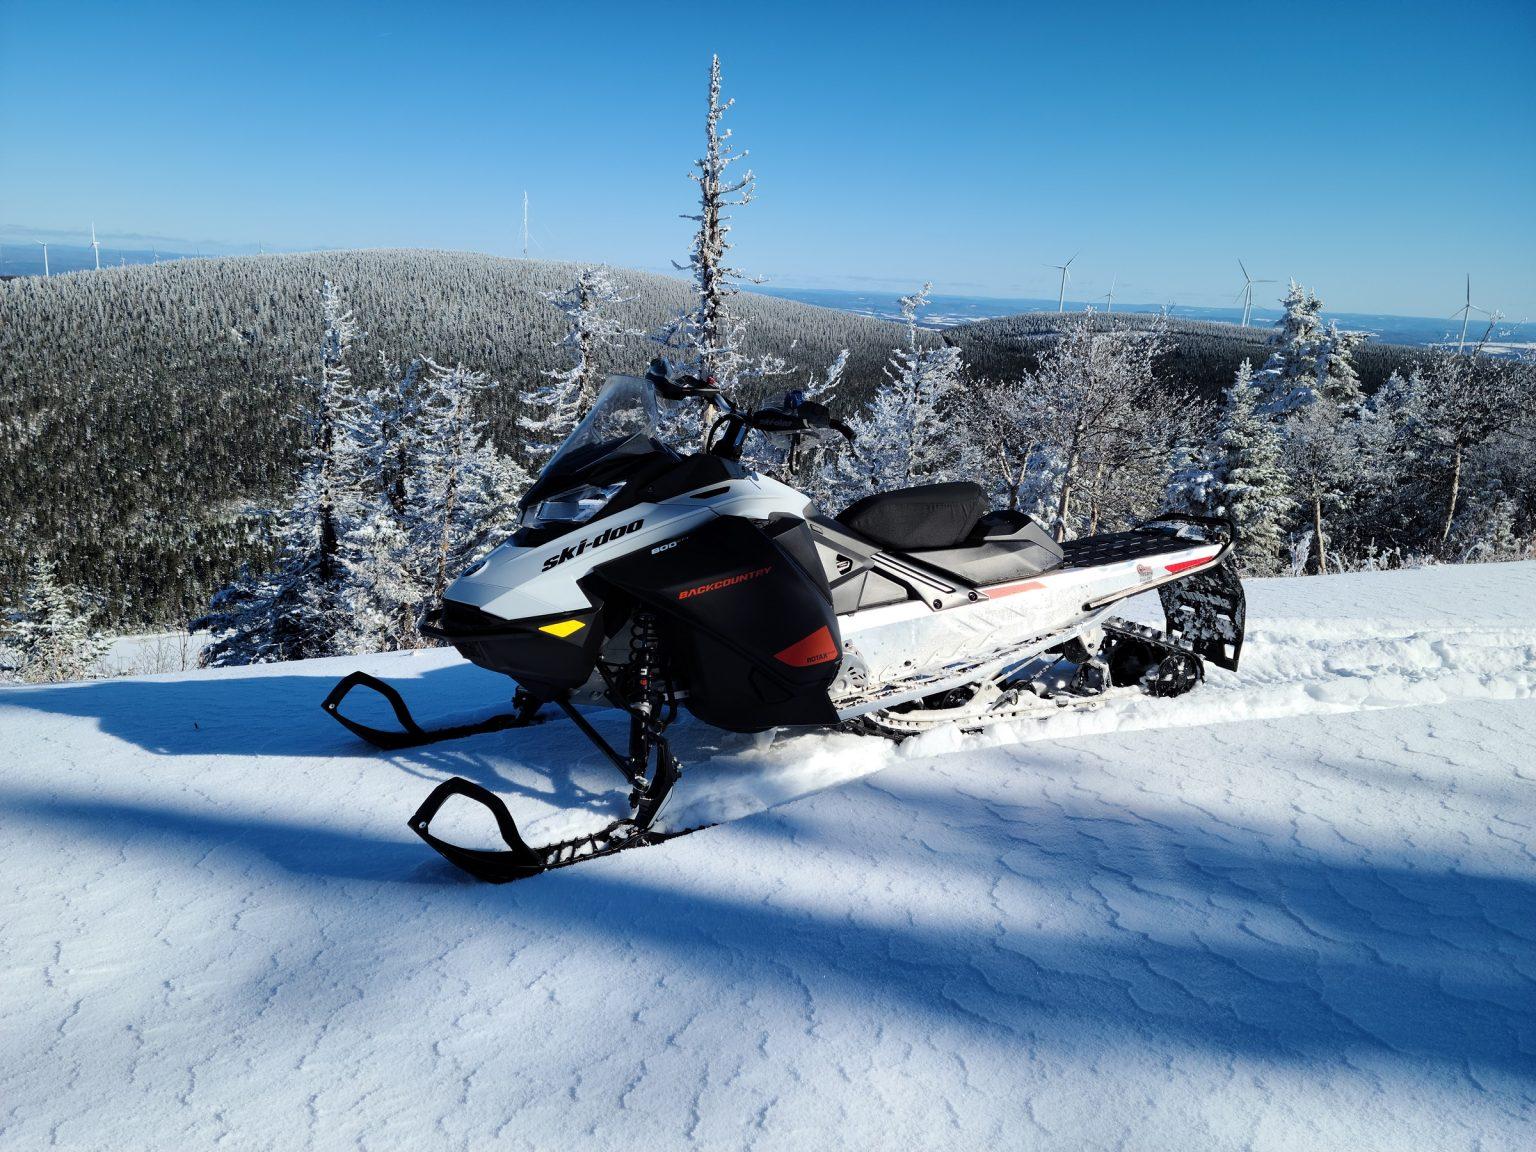 Ski-Doo Backcountry Sport 600 EFI 2021